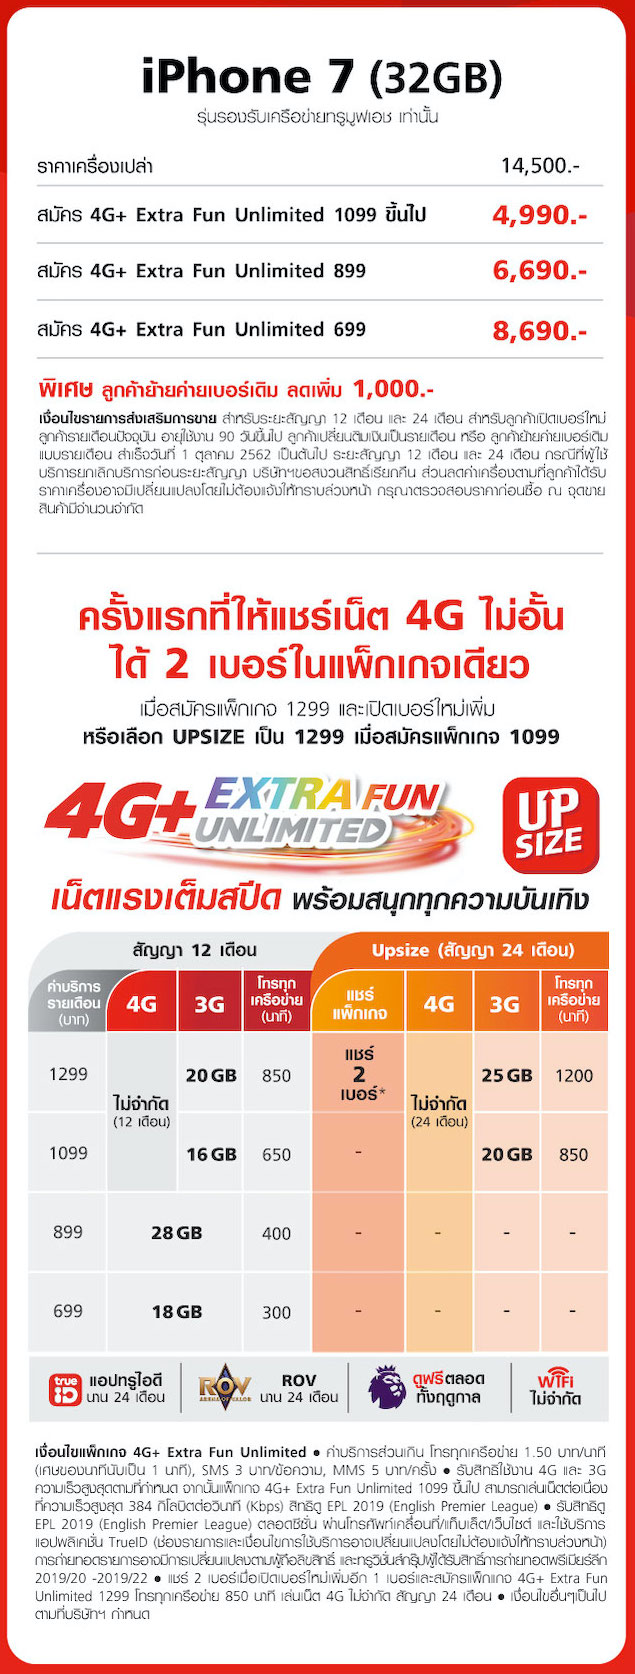 Truemove H Iphone 7 32gb 4990 Promotion Img 1